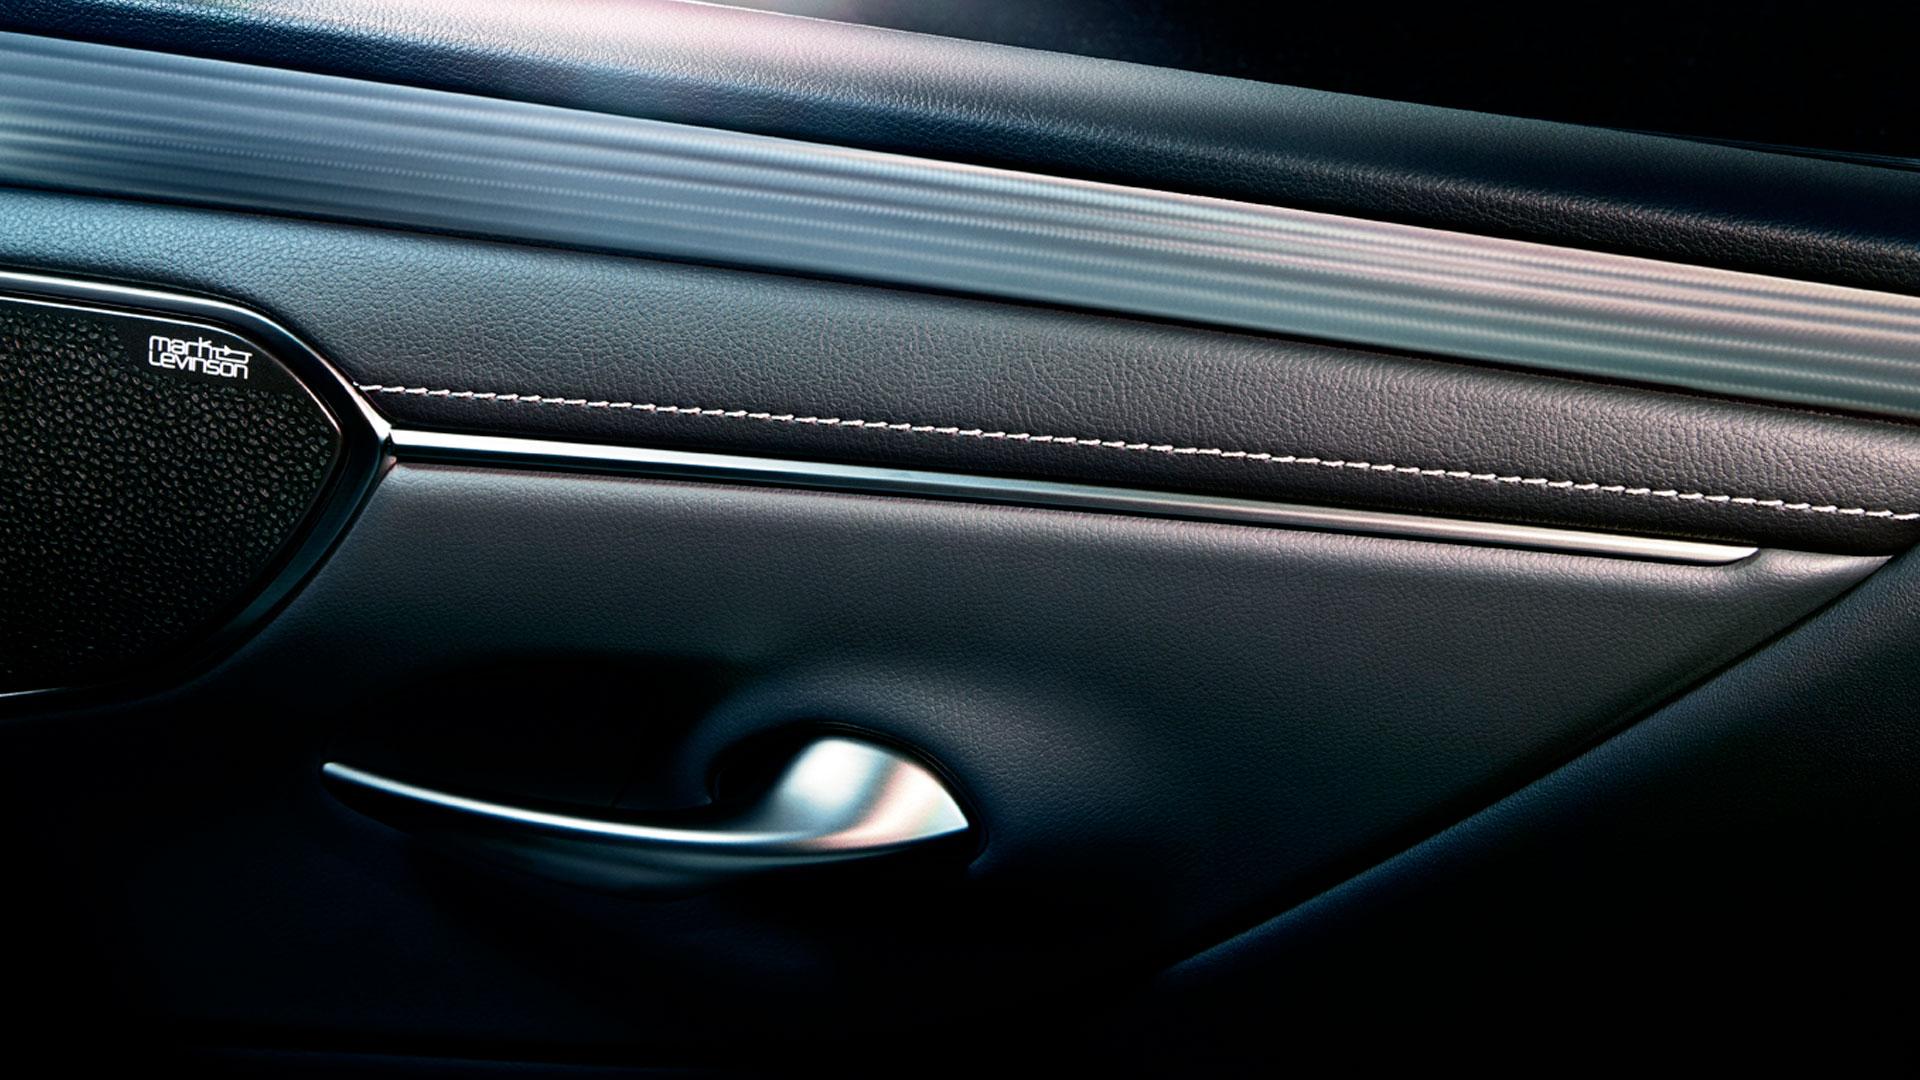 Imagen del interior de la puerta del Lexus ES 300h